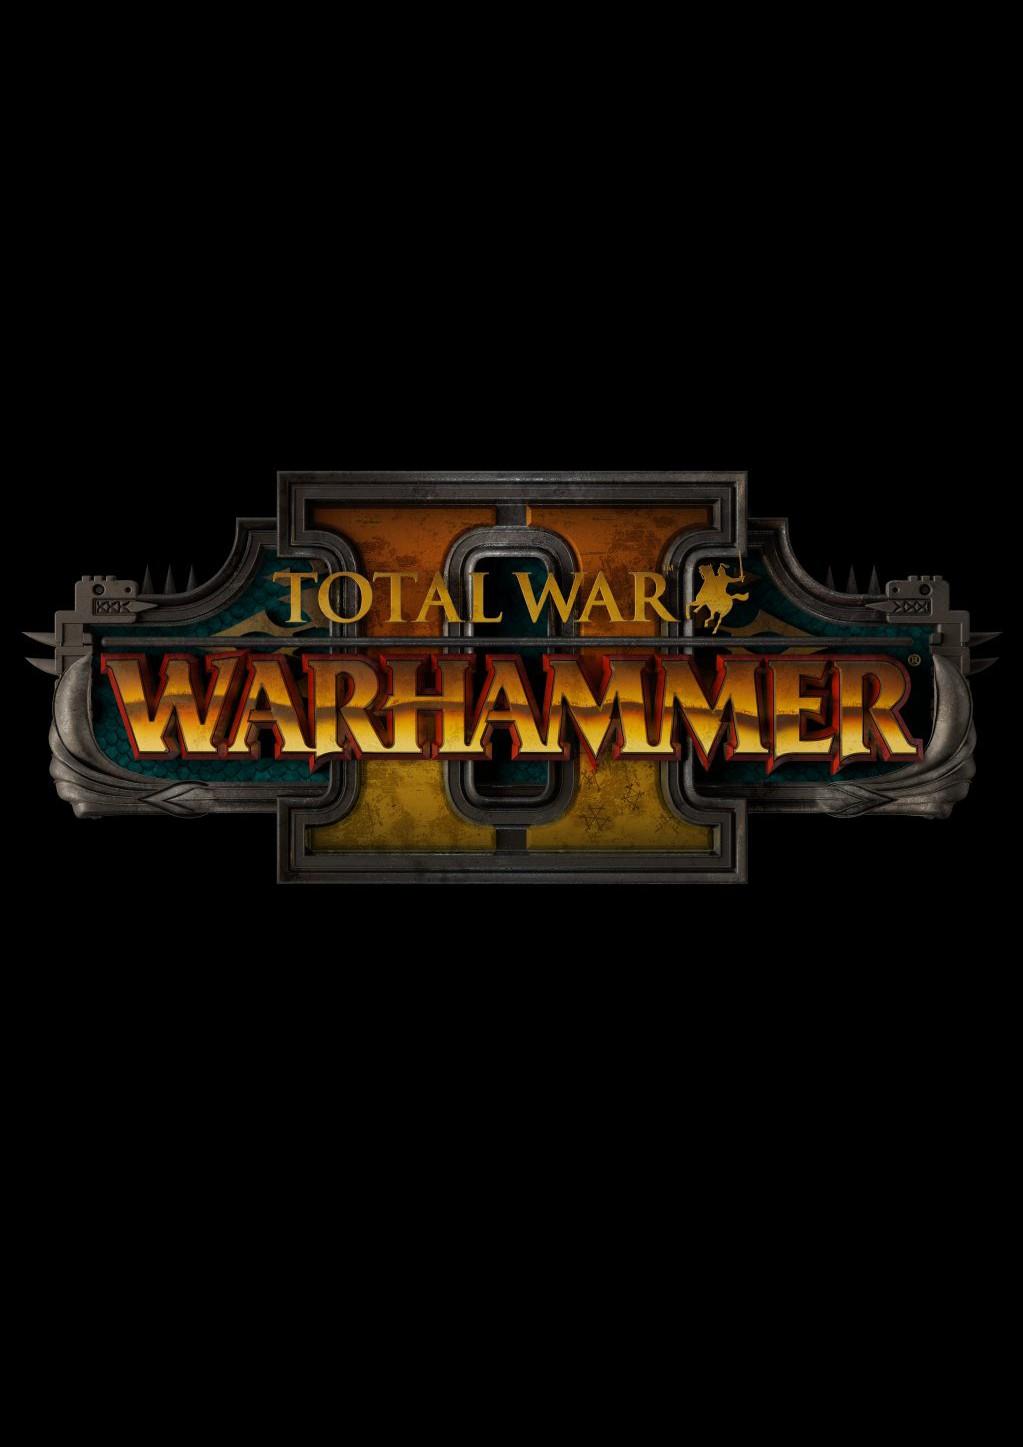 Total War WARHAMMER 2 Steam Key Gloabl